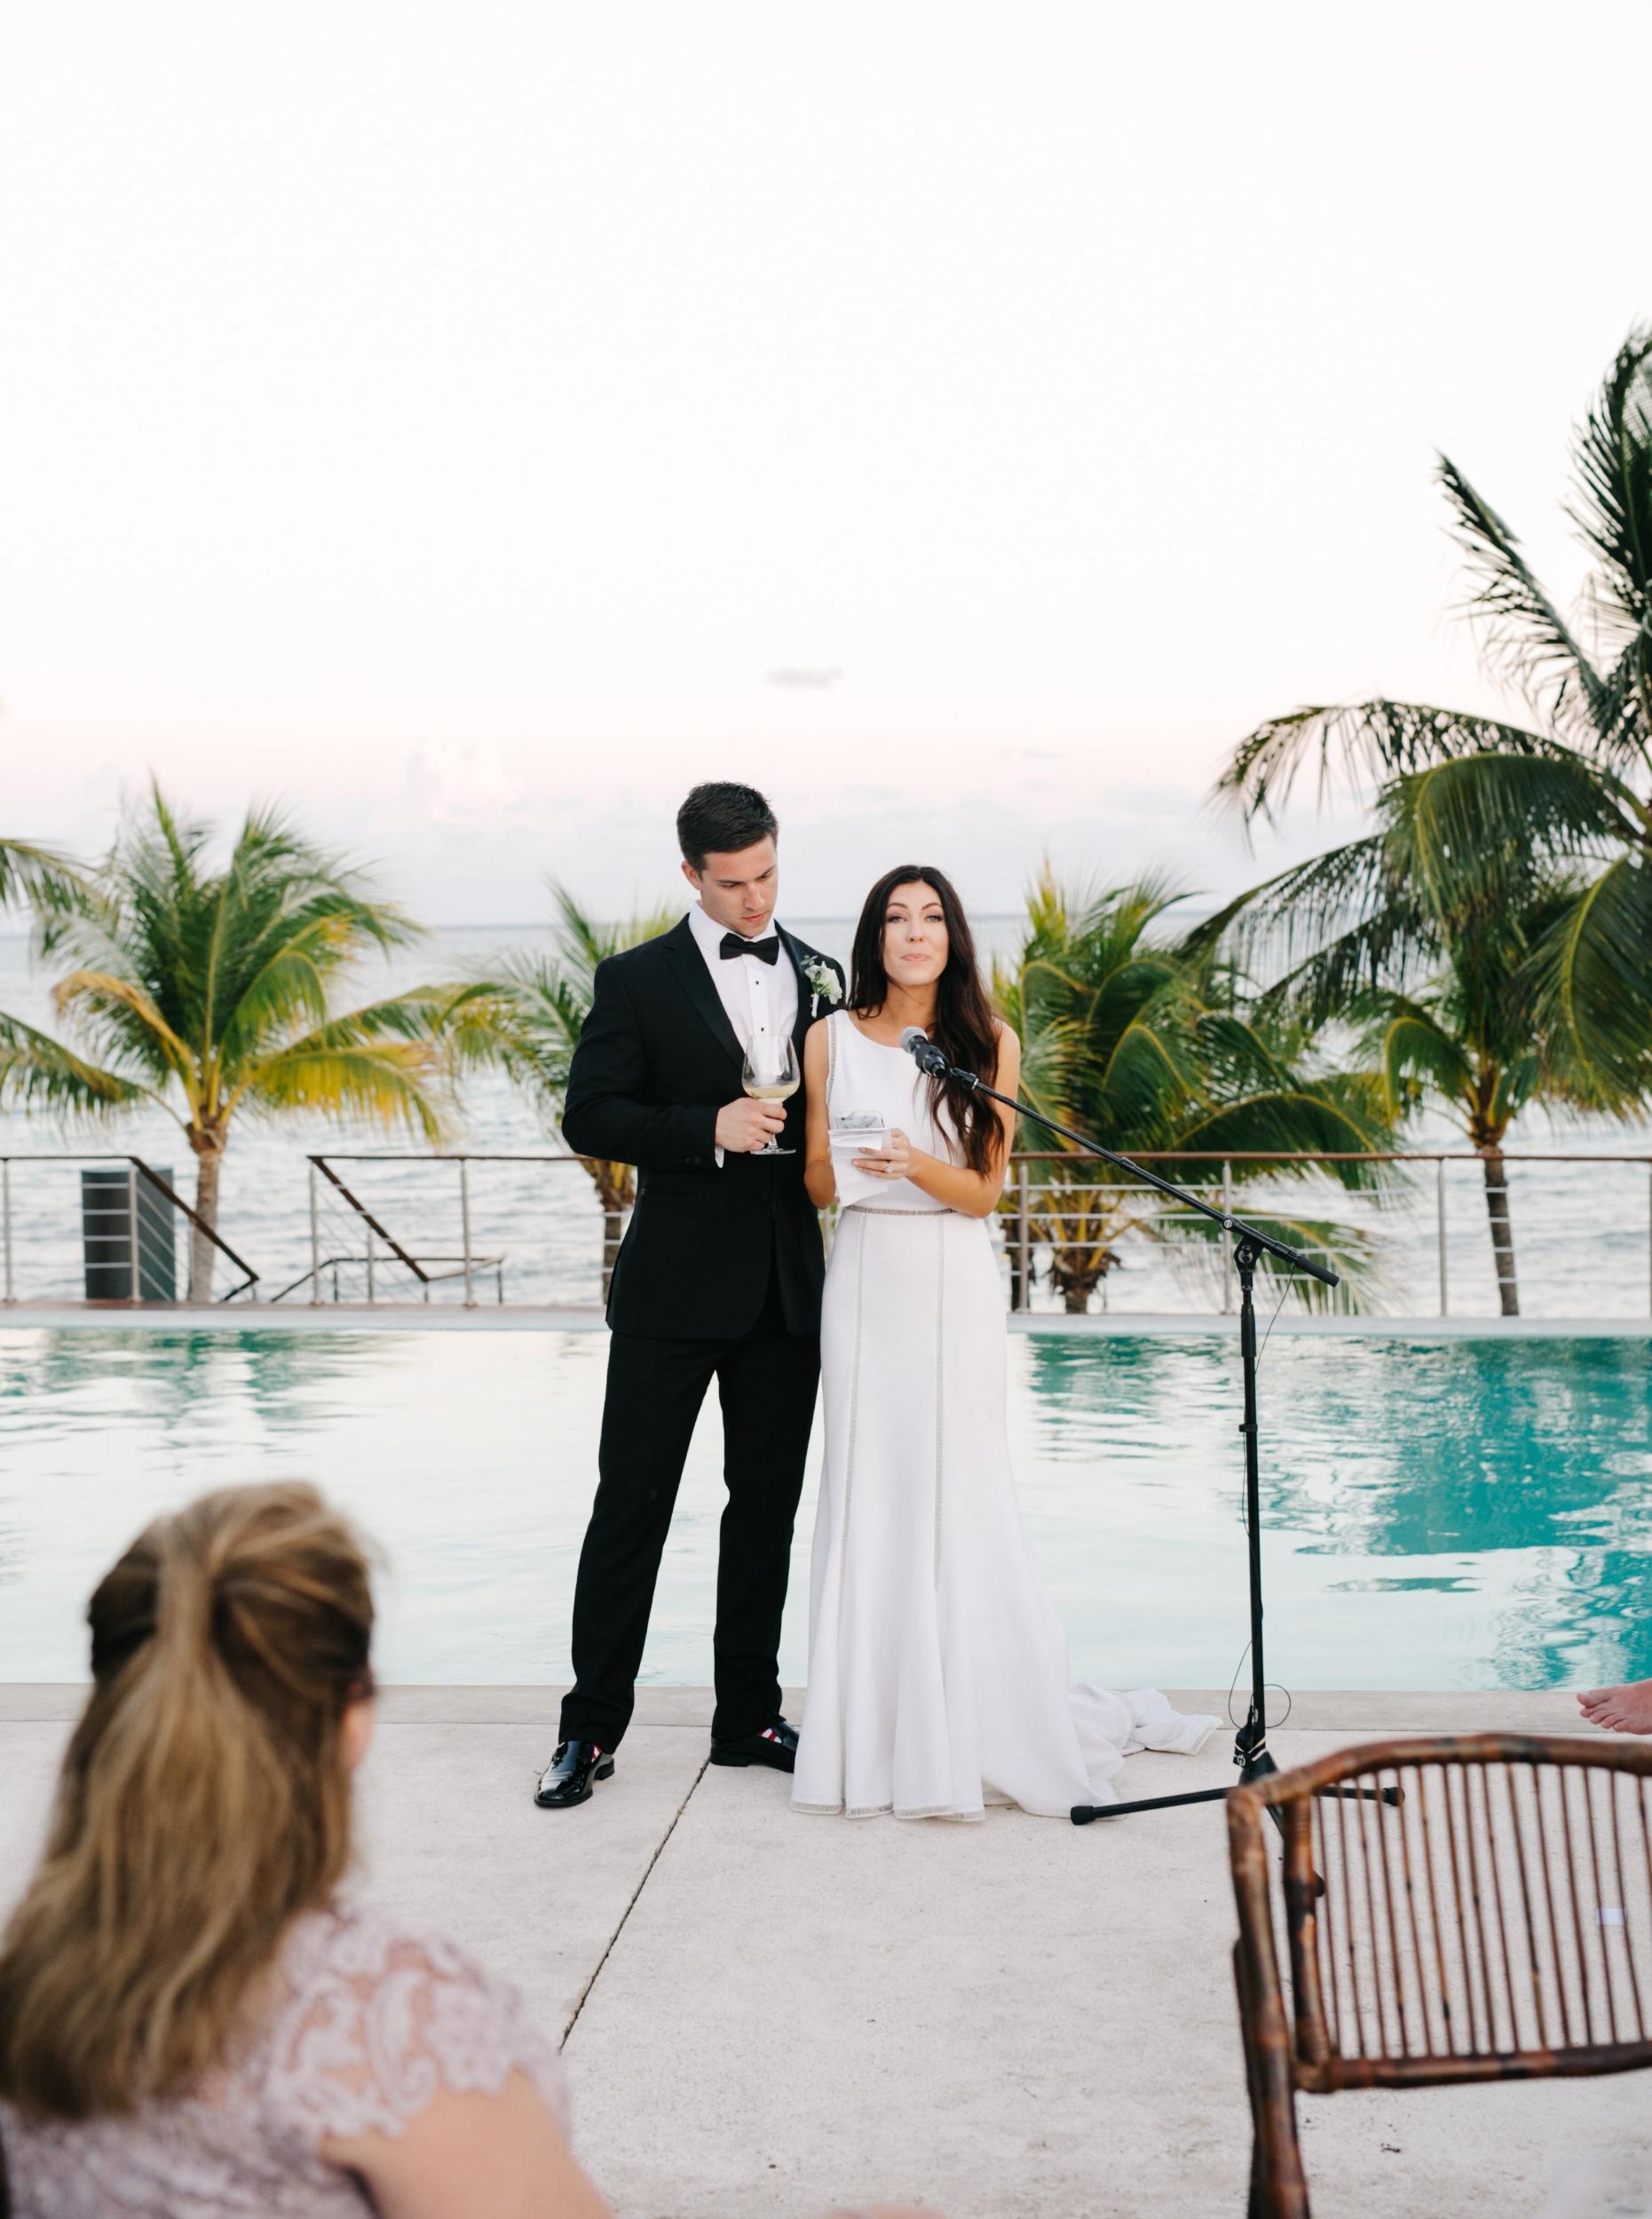 Kyle John l Fine Art Wedding Photography l Chicago, Copenhagen, California, New York, Destination l Blog l Brooke Boyd_The Film Poets_Tulum Wedding_40